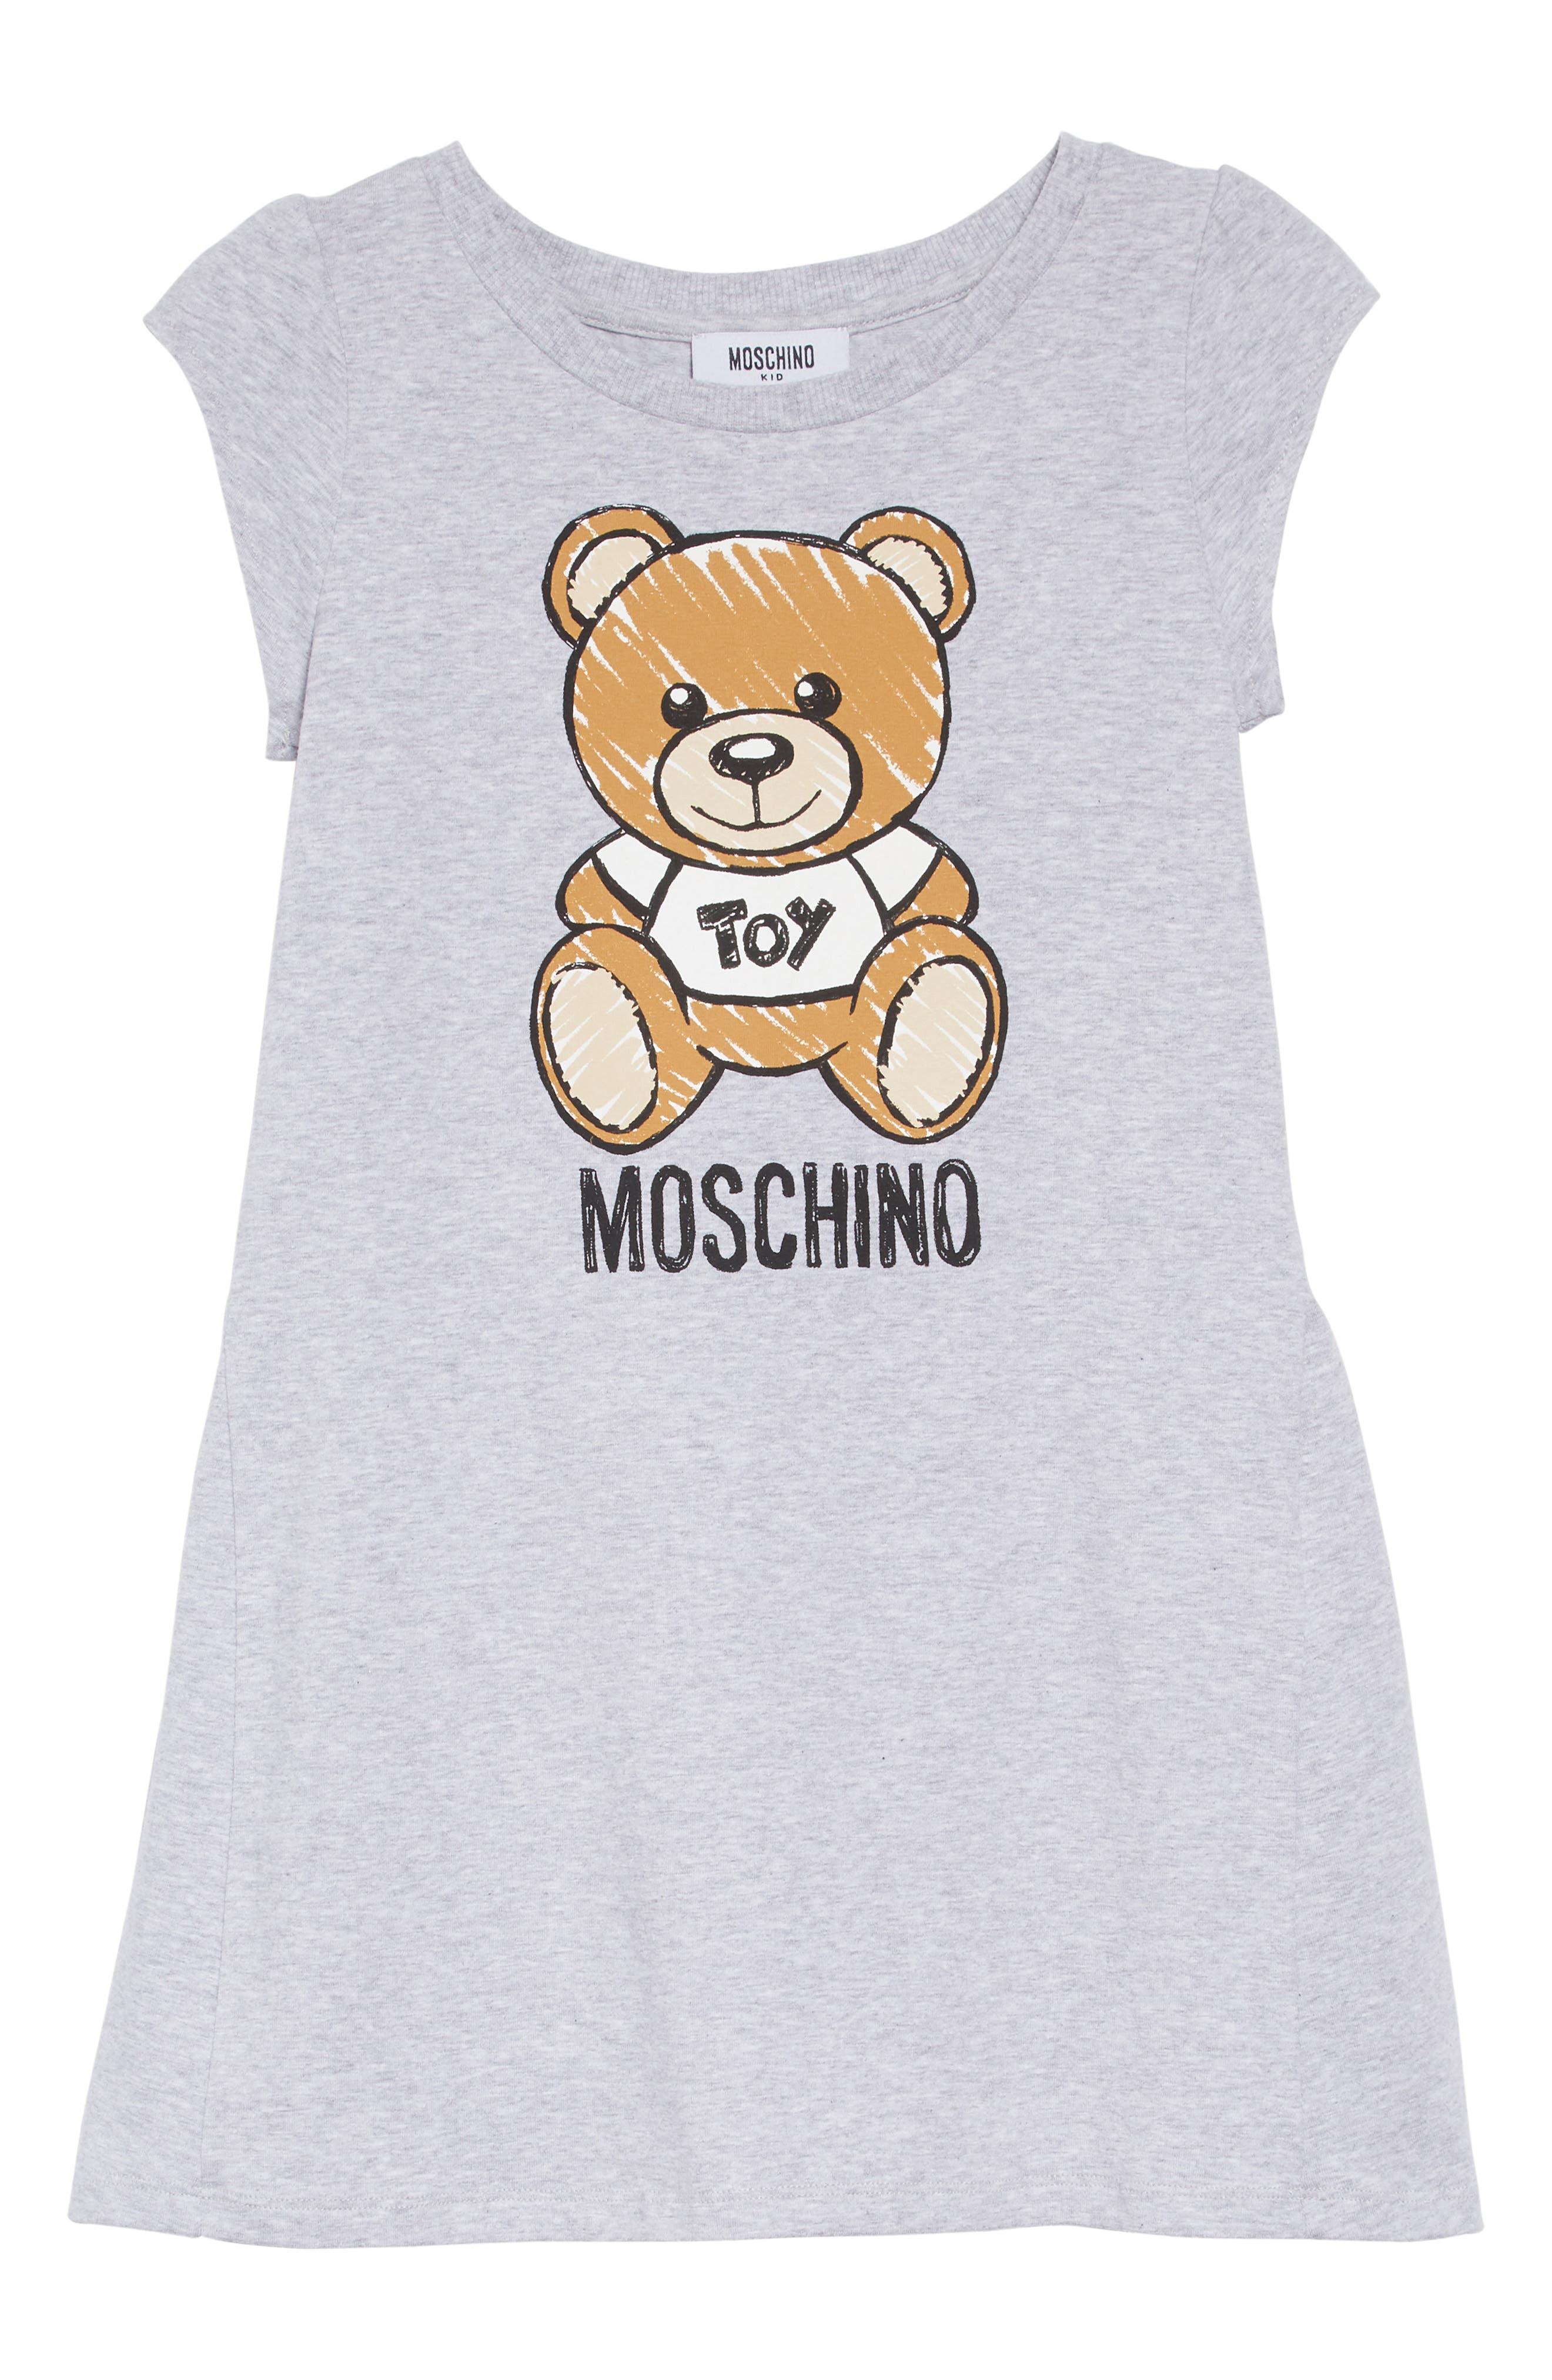 Girls Moschino Bear Print Dress Size 6Y  Grey